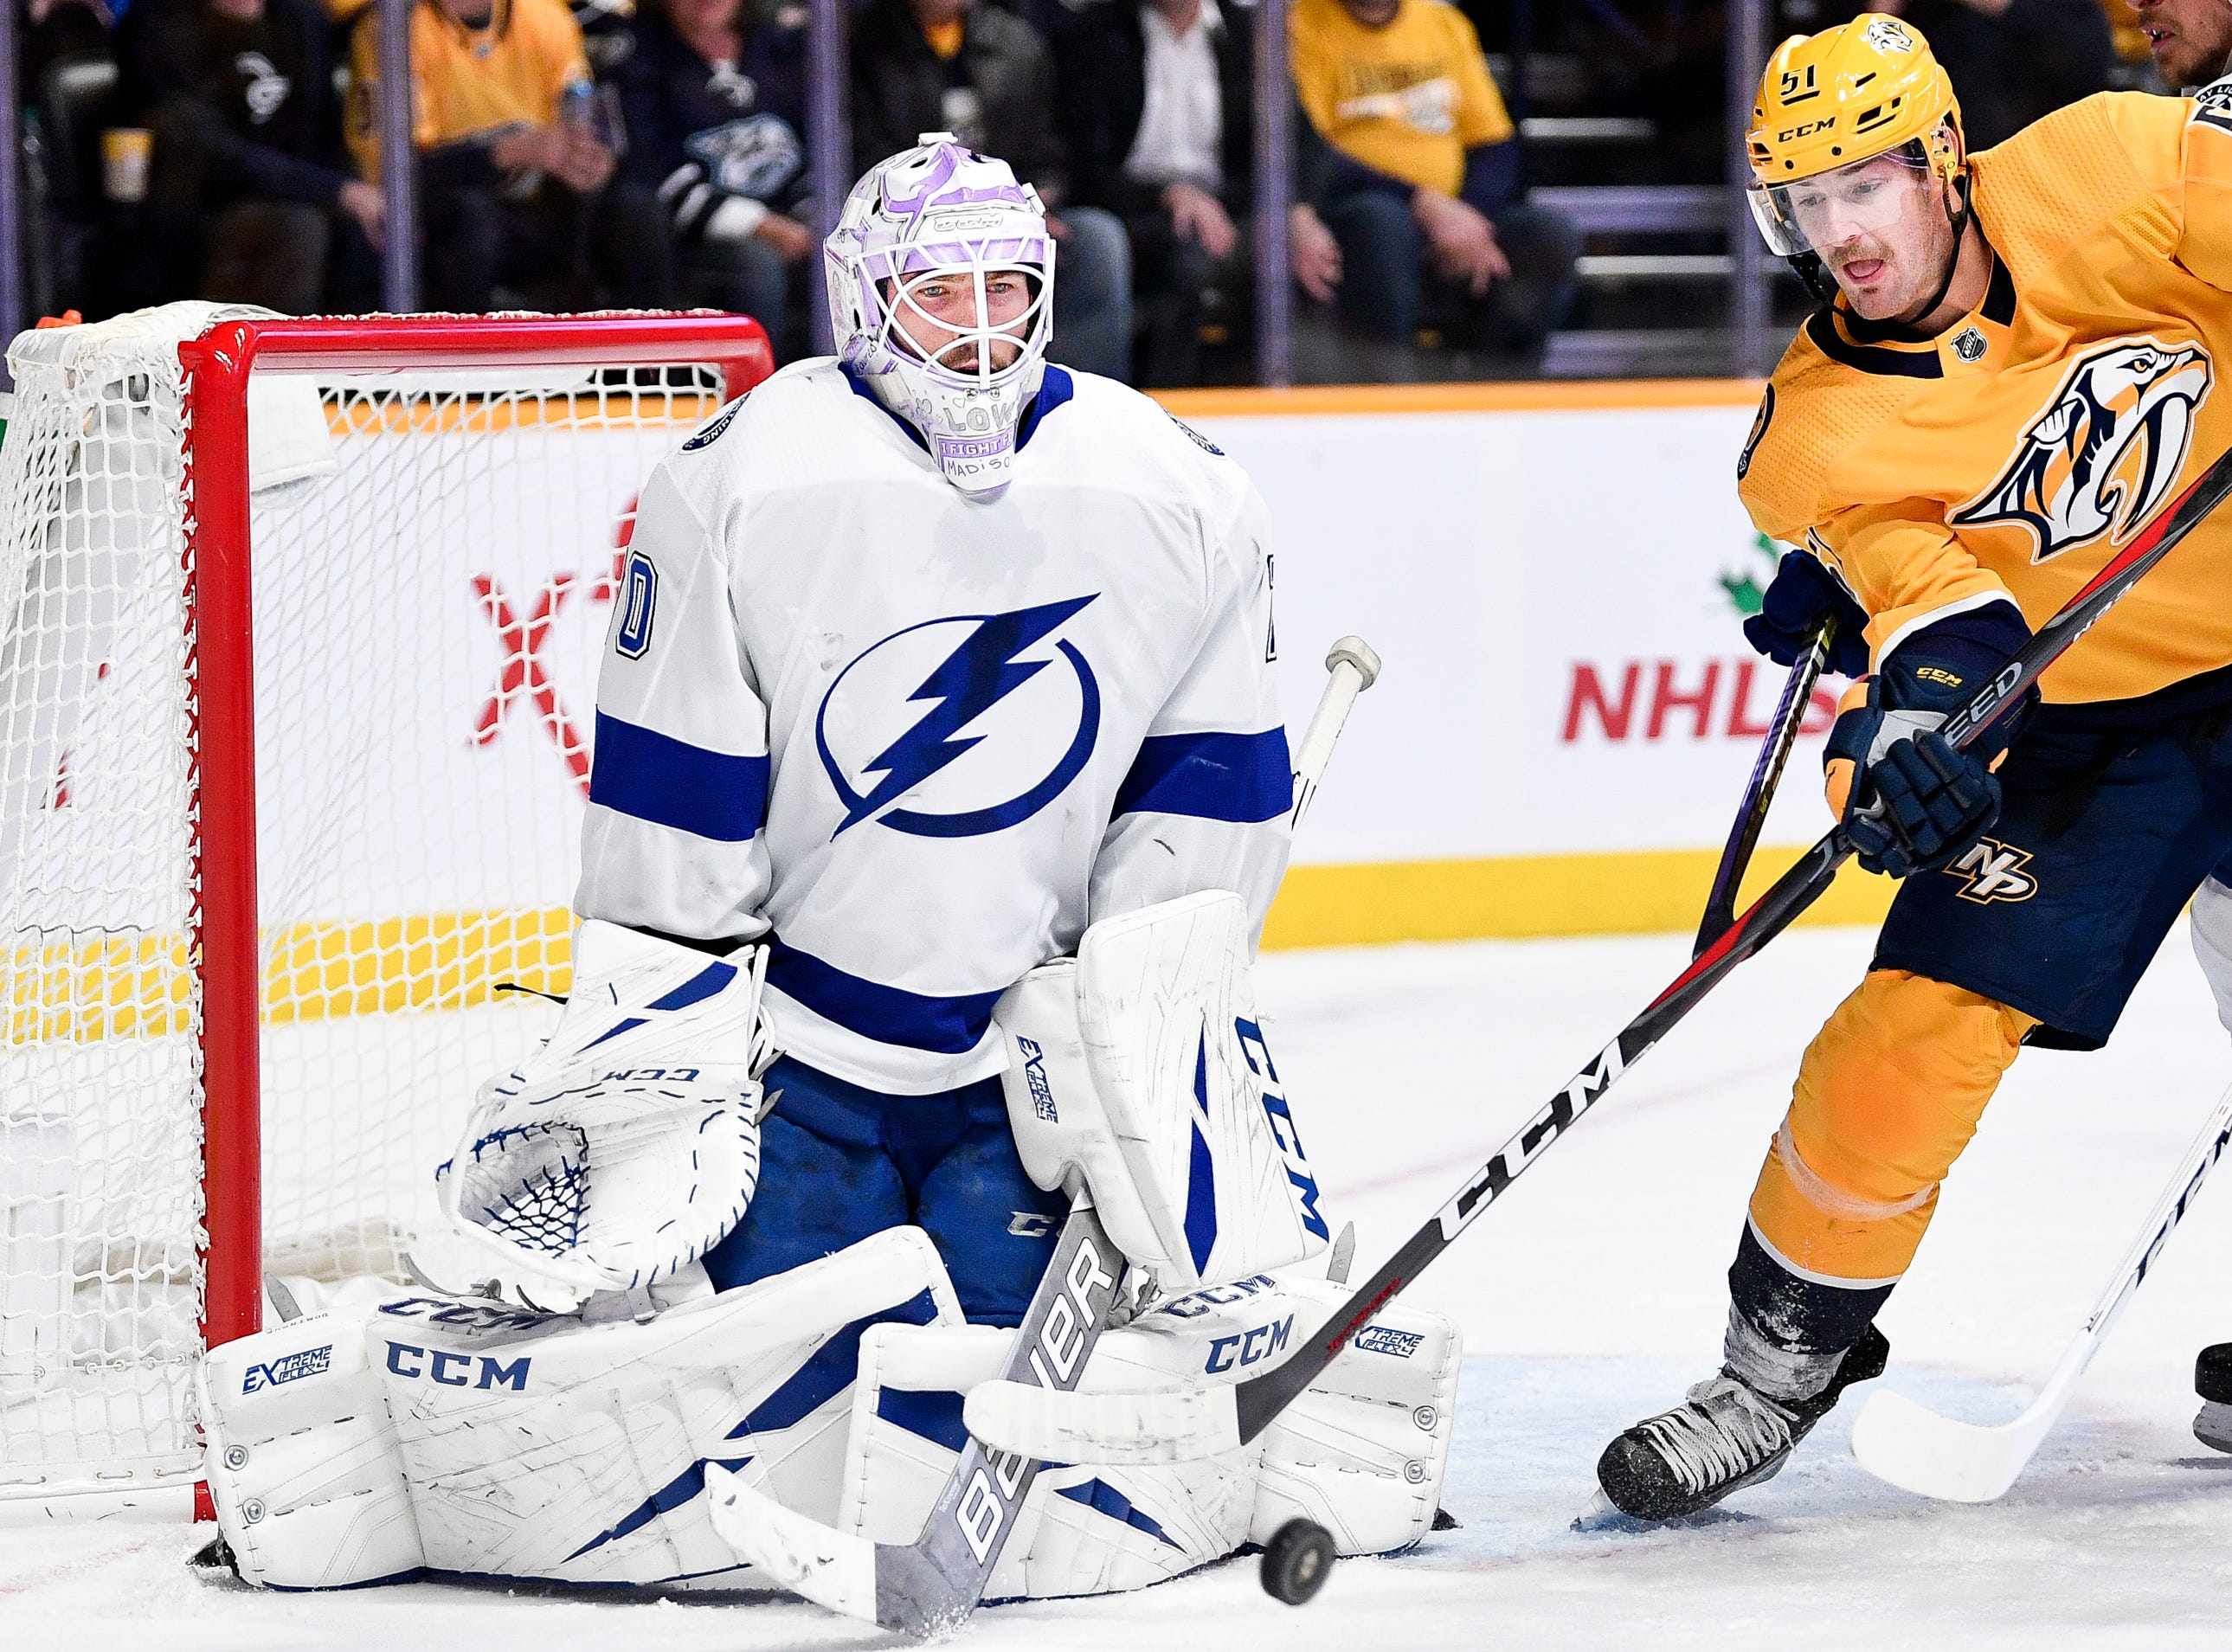 Tampa Bay Lightning goaltender Louis Domingue (70) battles Nashville Predators left wing Austin Watson (51) during the first period at Bridgestone Arena in Nashville, Tenn., Monday, Nov. 19, 2018.